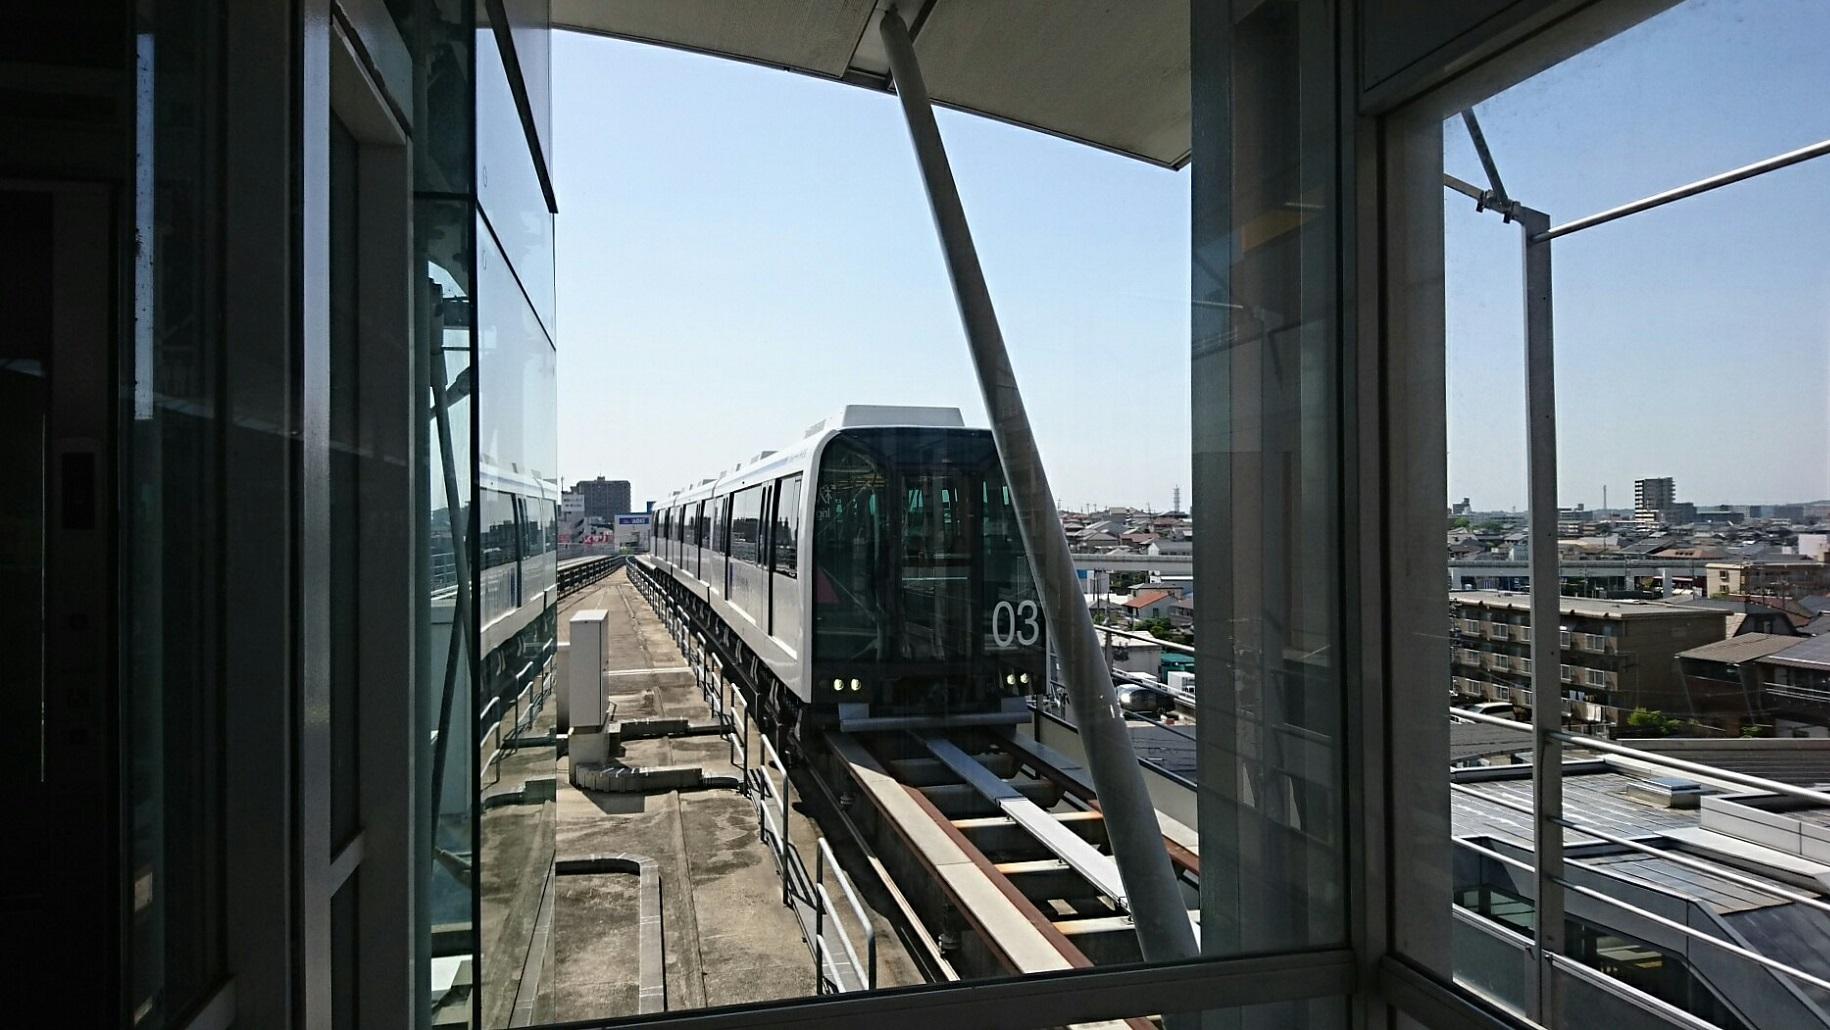 2018.5.25 日進中央線 (75) 杁ヶ池公園 - 八草いき 1830-1030